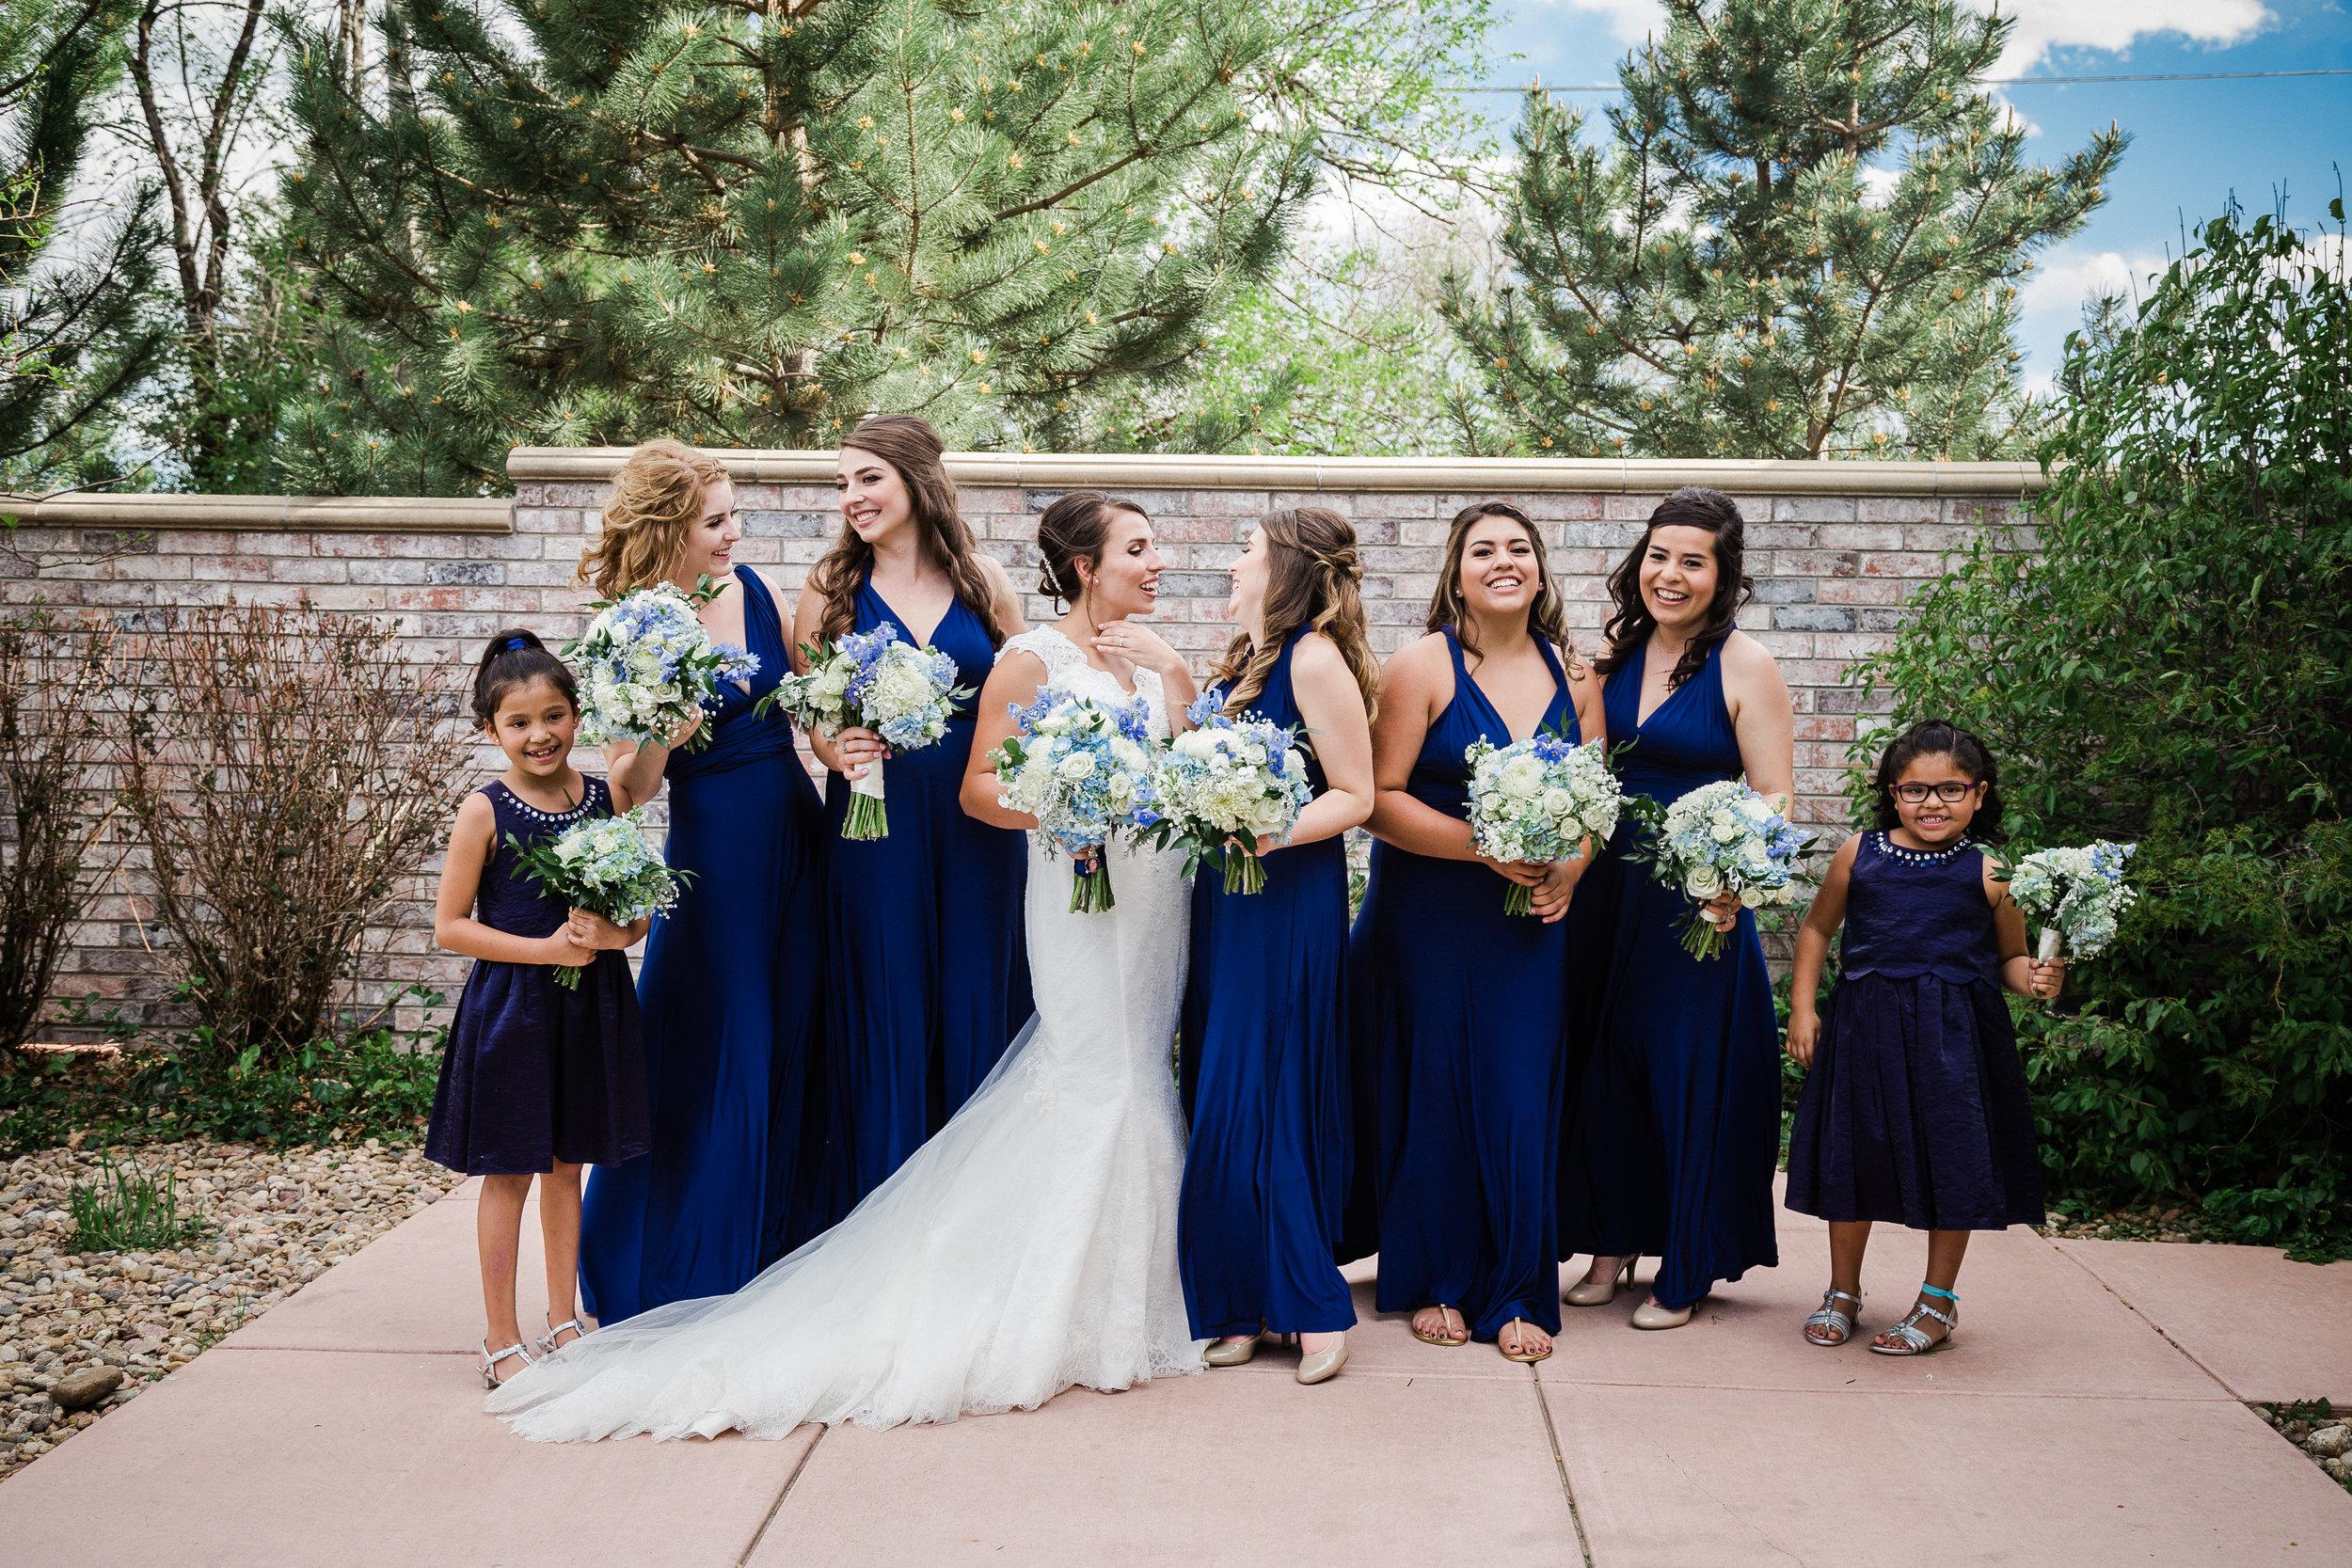 Denver-wedding-hairstylist-Colorado-updo-specialist-traveling-wedding-hairstylist